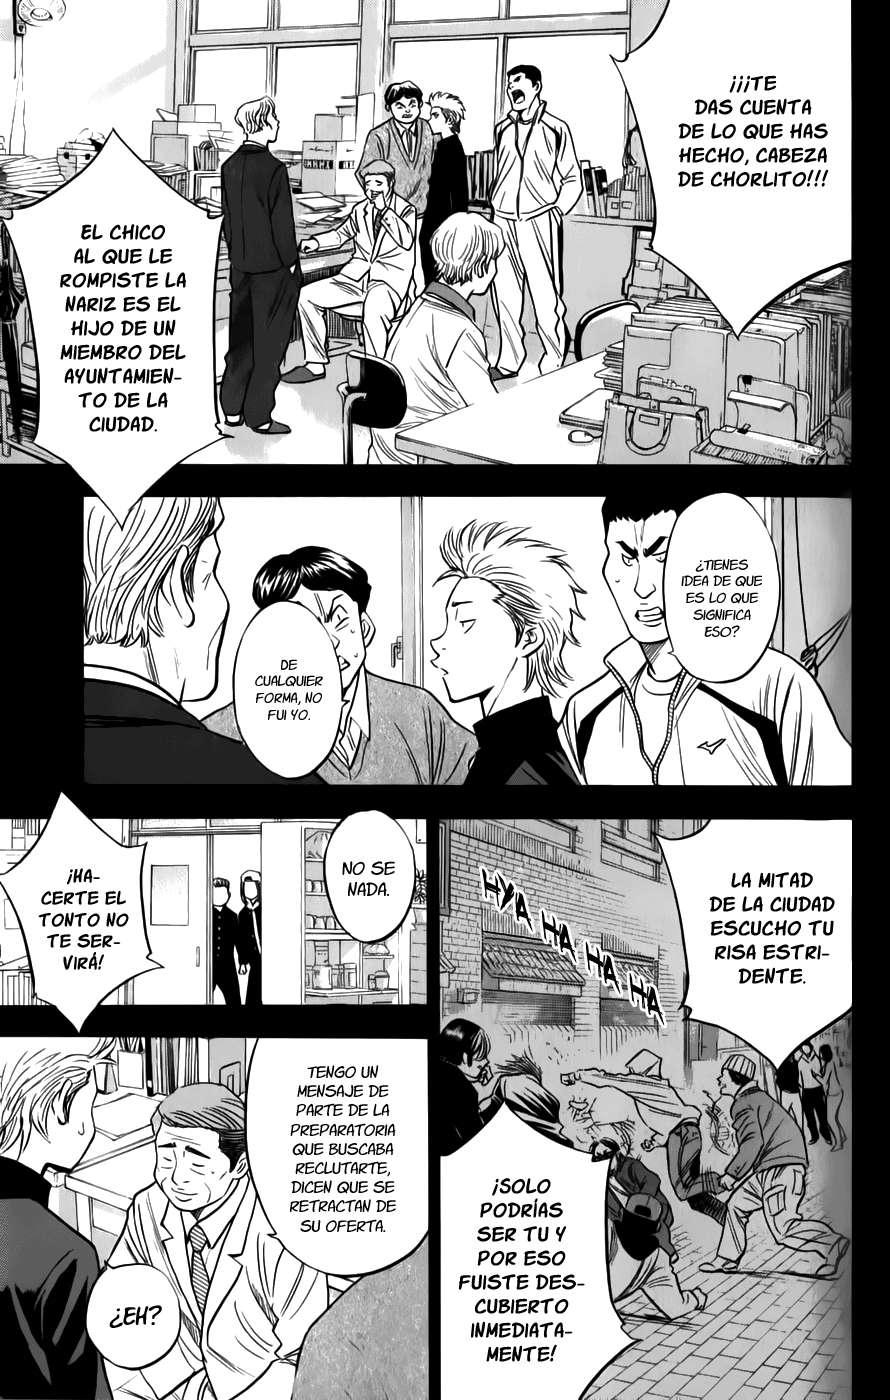 http://c5.ninemanga.com/es_manga/24/1752/422722/cc281a493d63c492153ba35b86dcc794.jpg Page 4